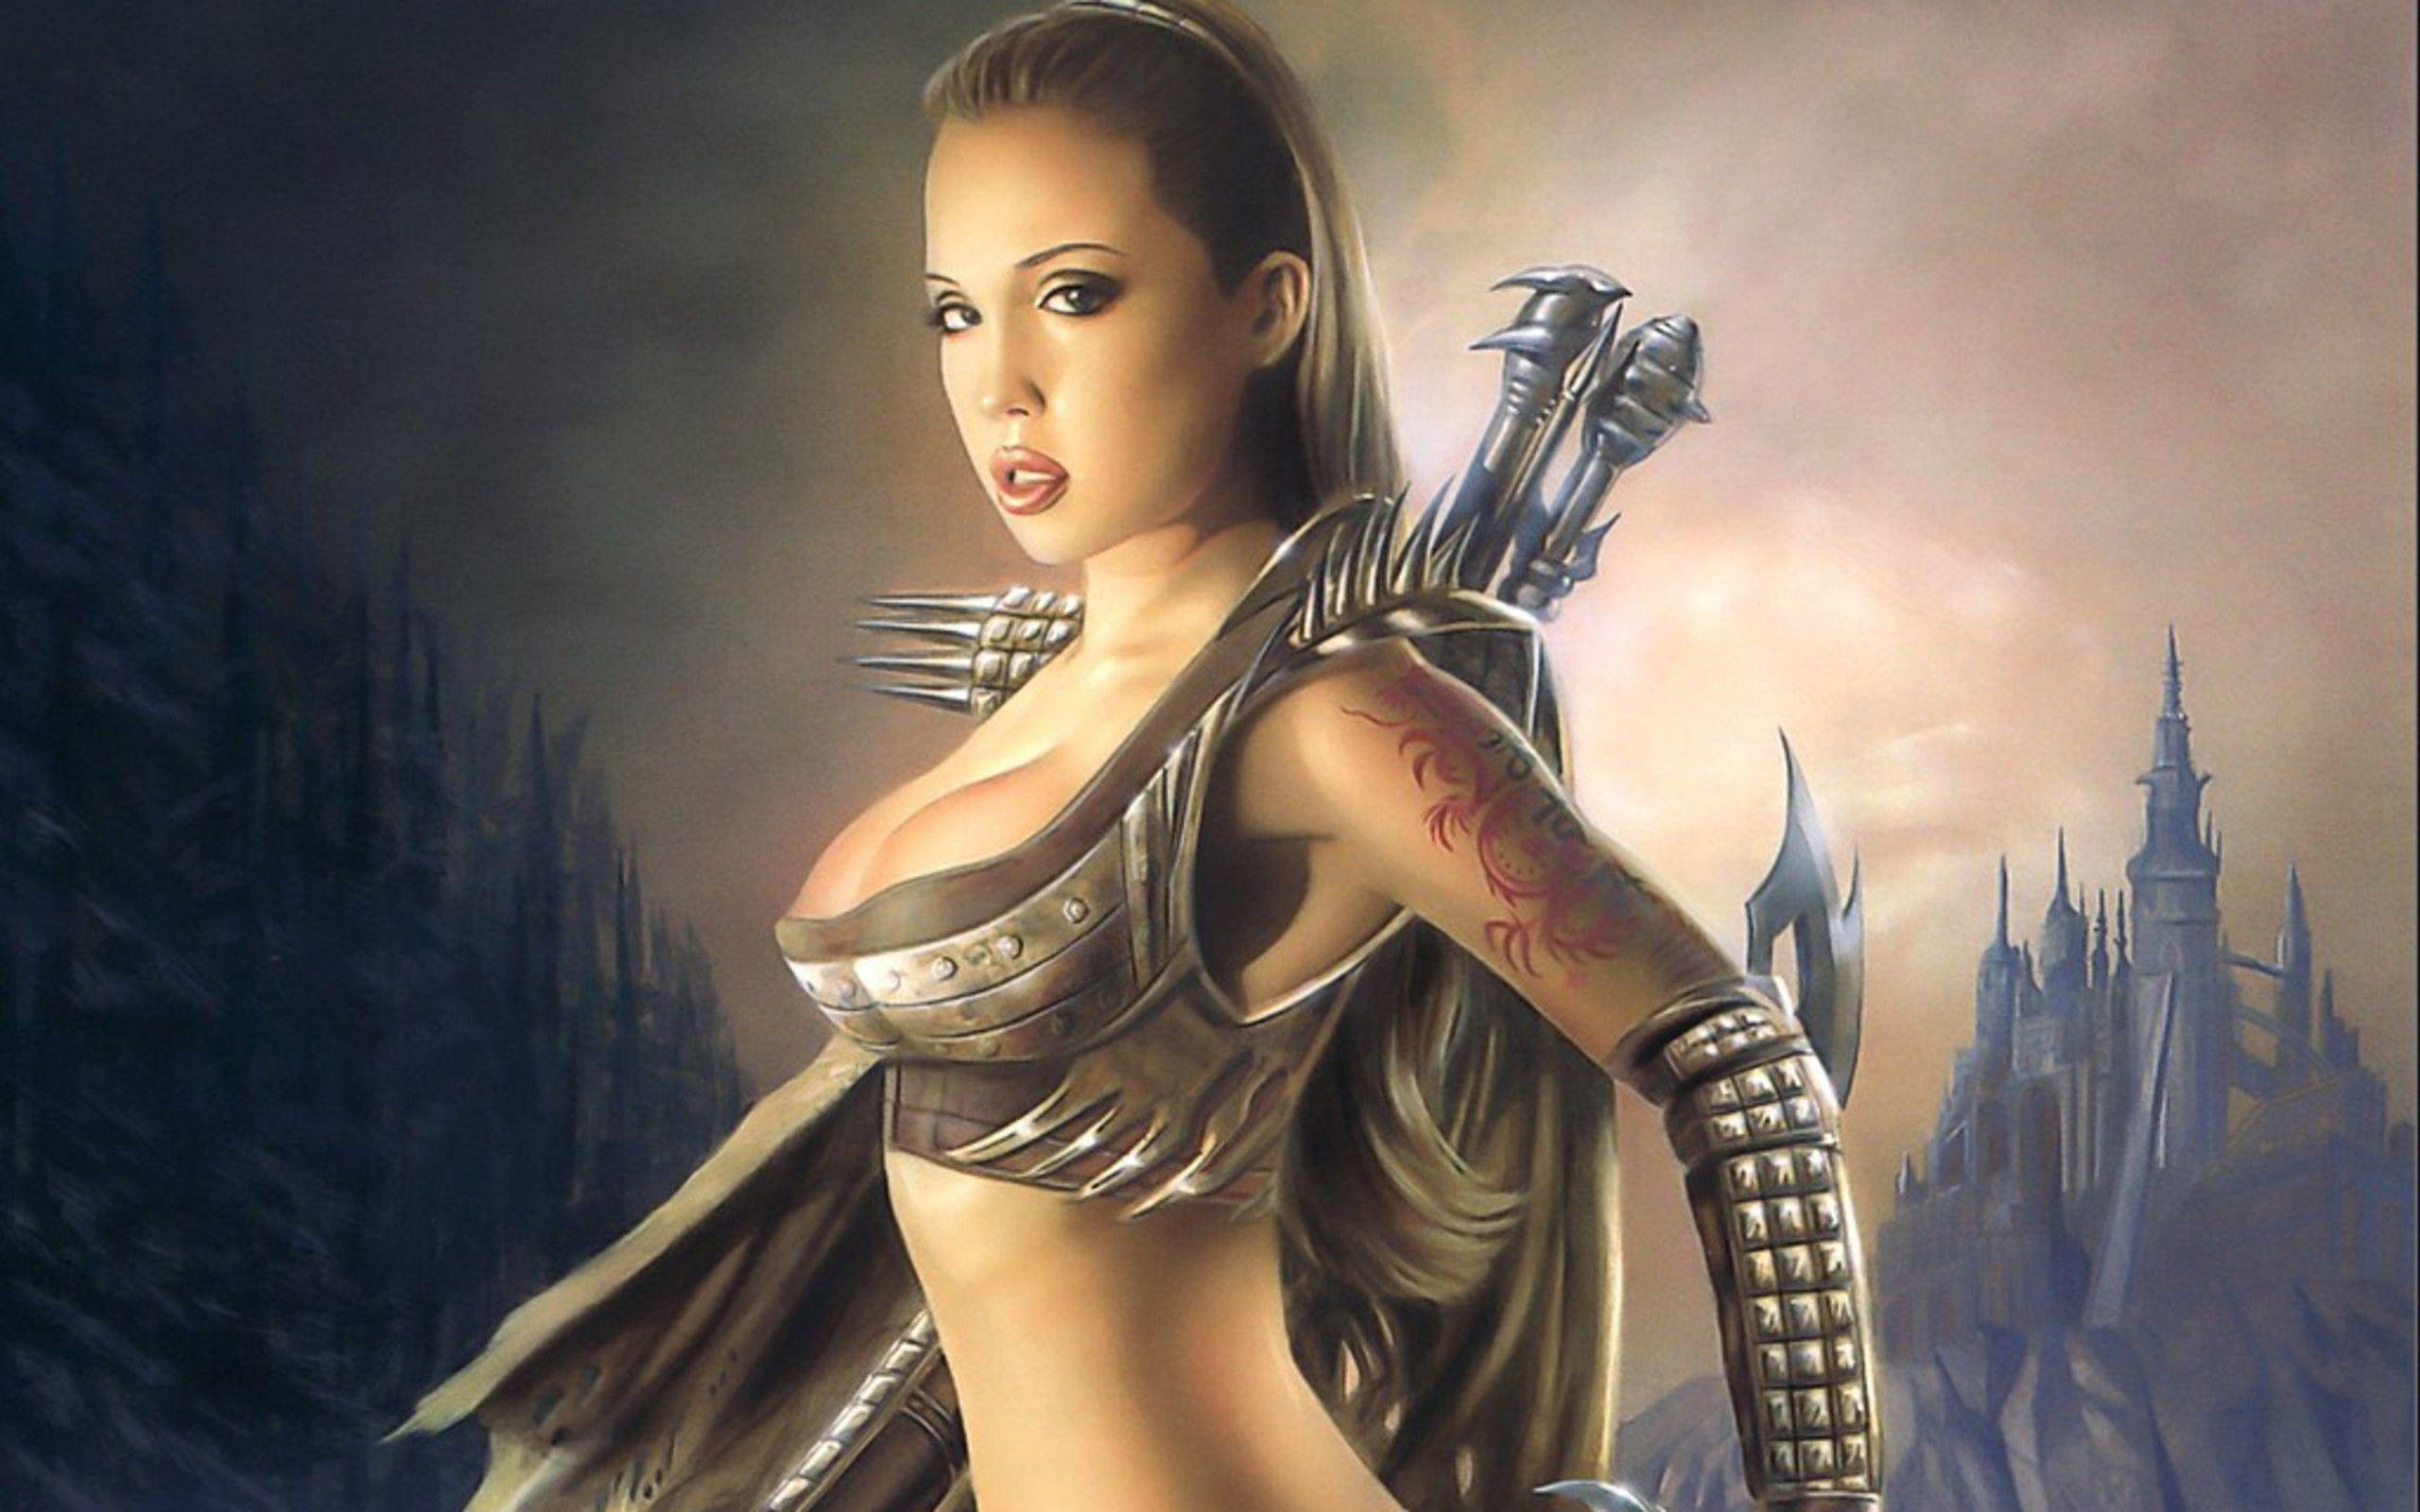 download free fantasy wallpapers | women wallpaper backgrounds